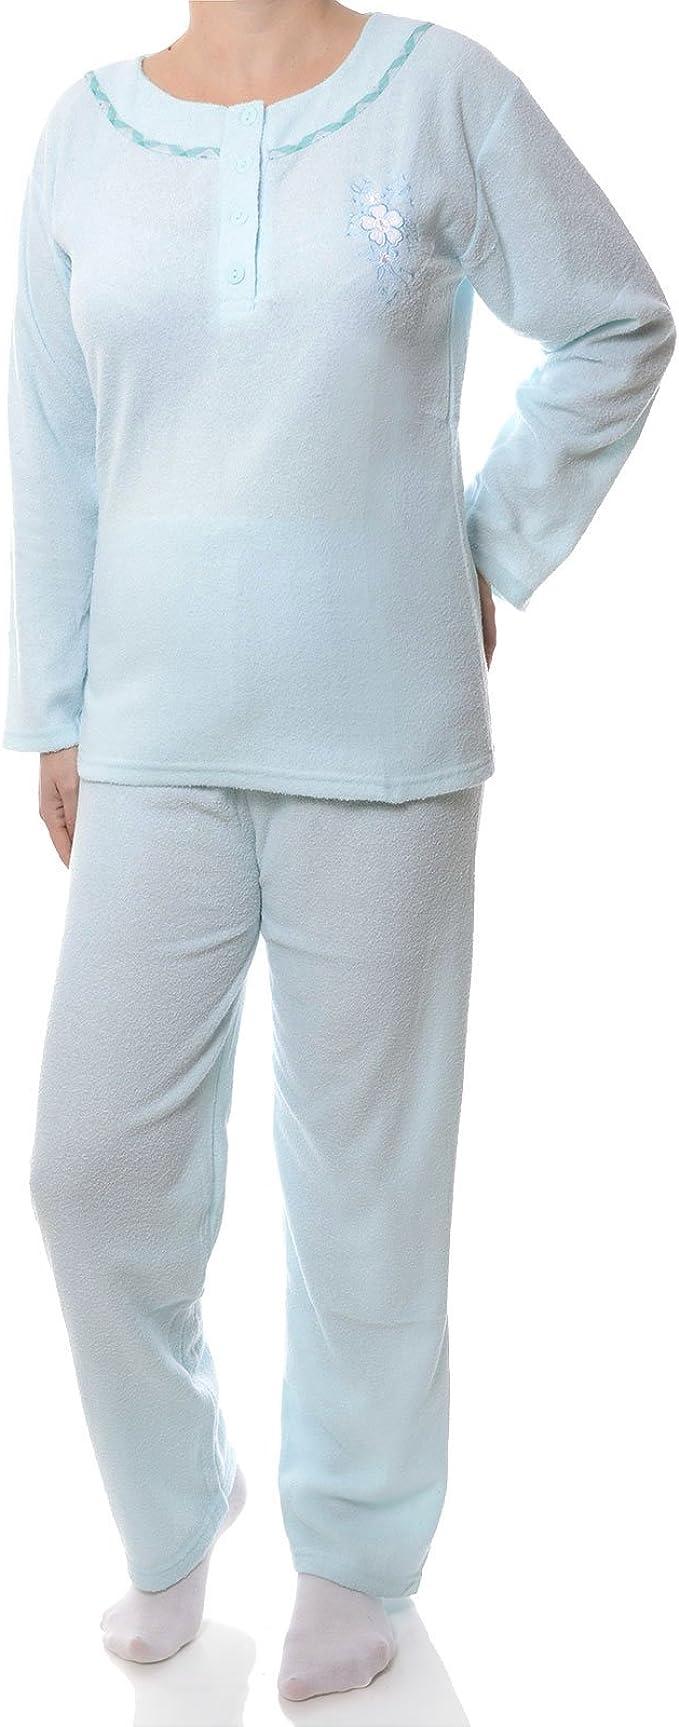 100 /% Baumwolle Damen Pyjama Set Langarm 4-teilig// Mintgrün